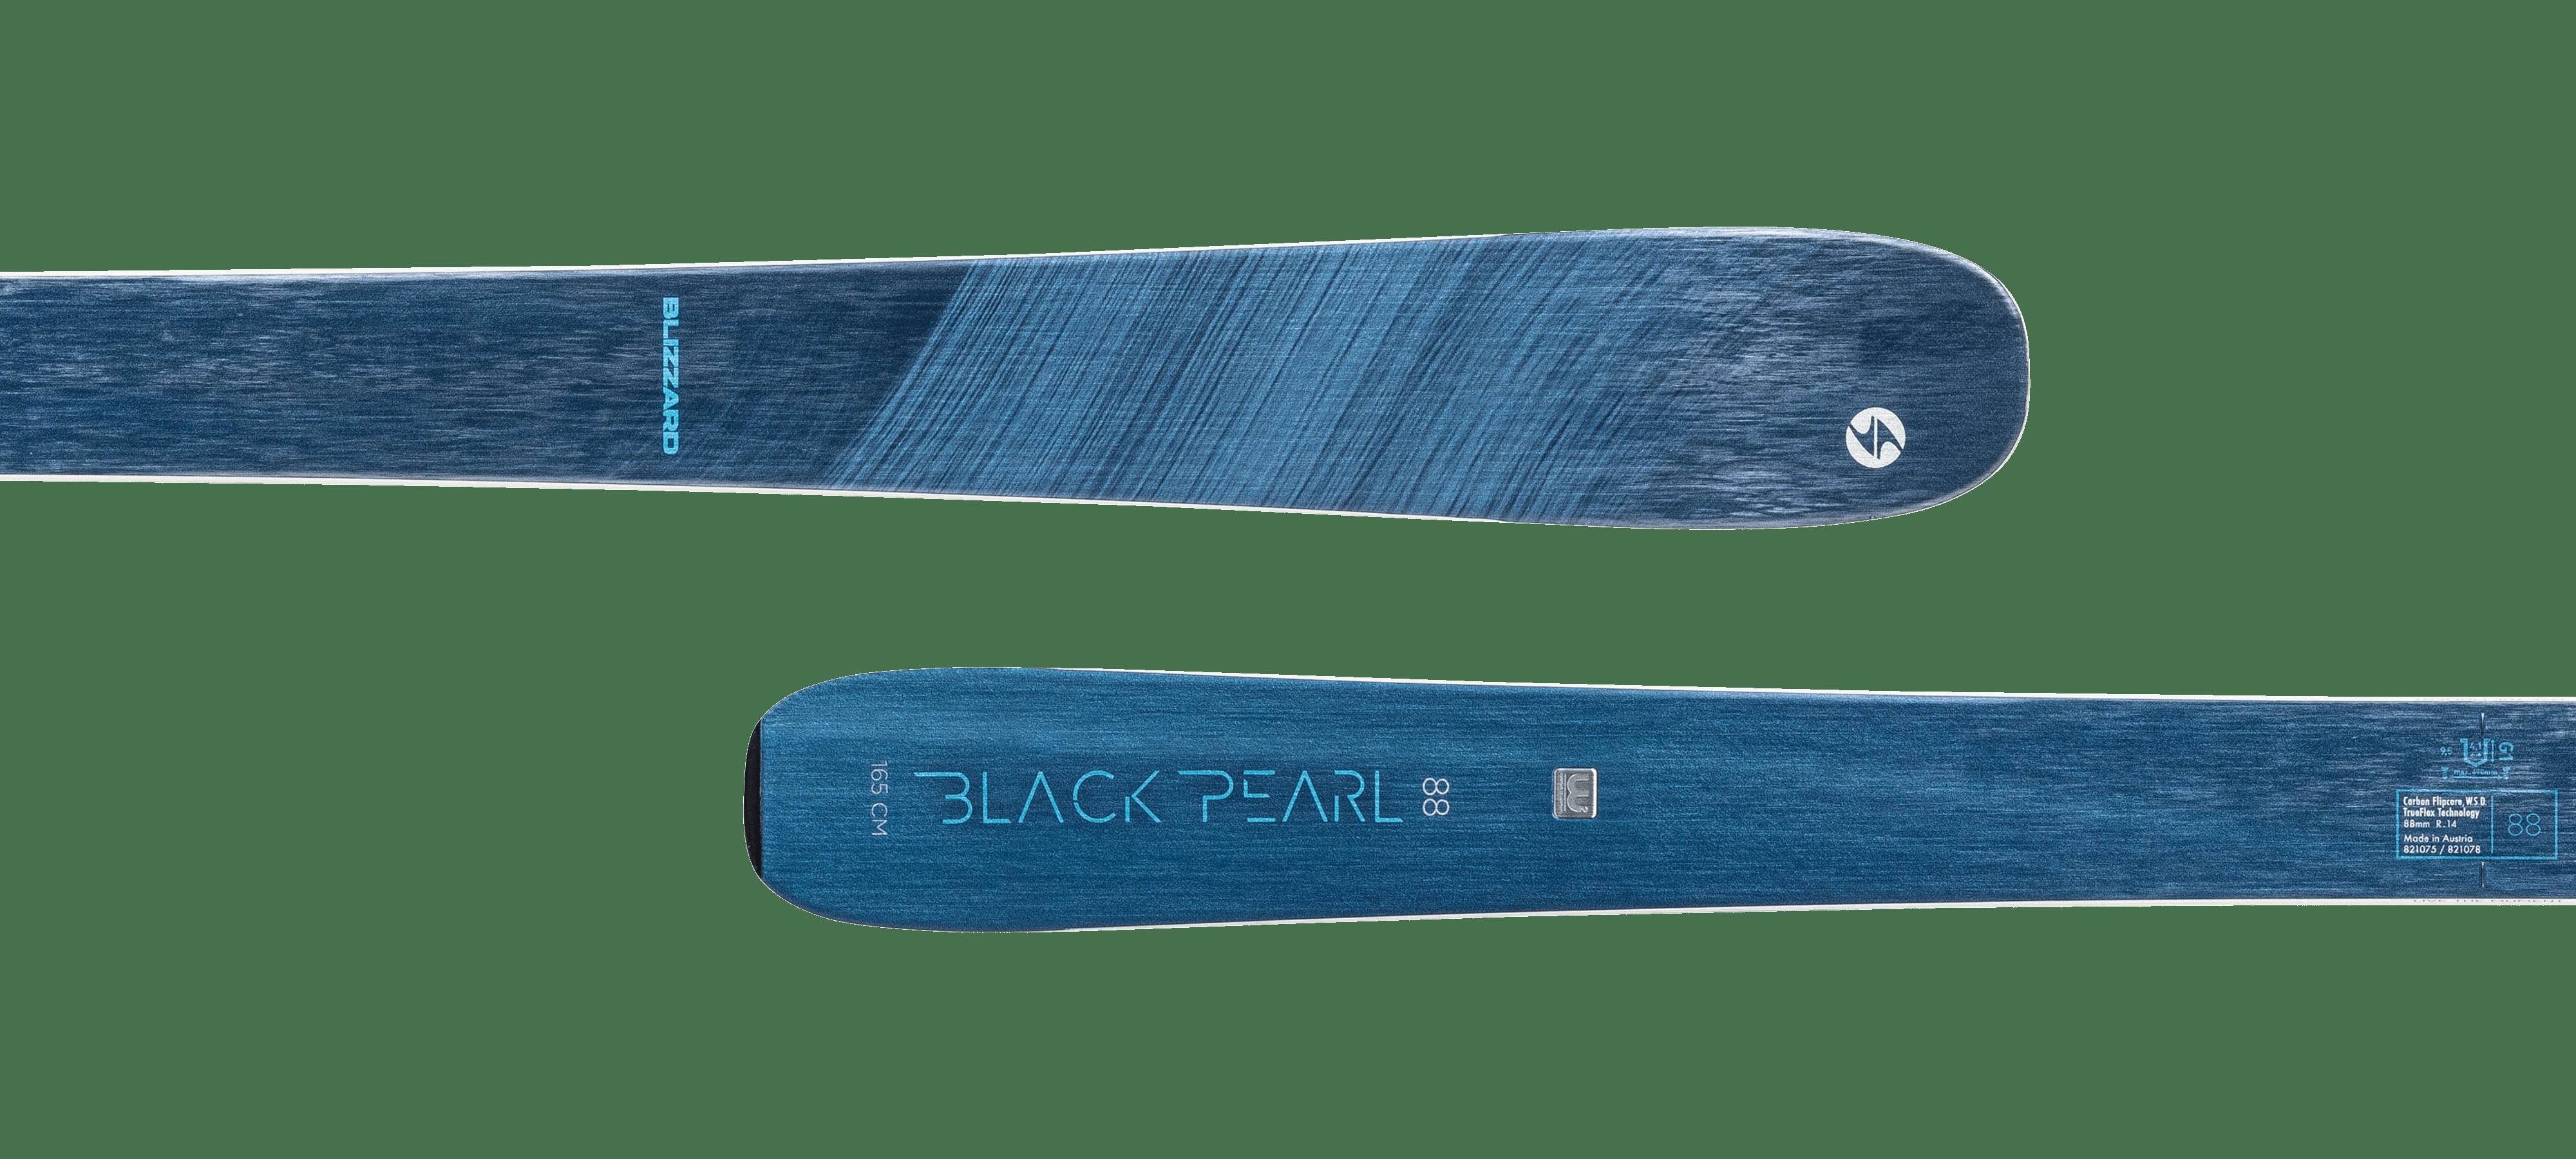 BLACK PEARL 88